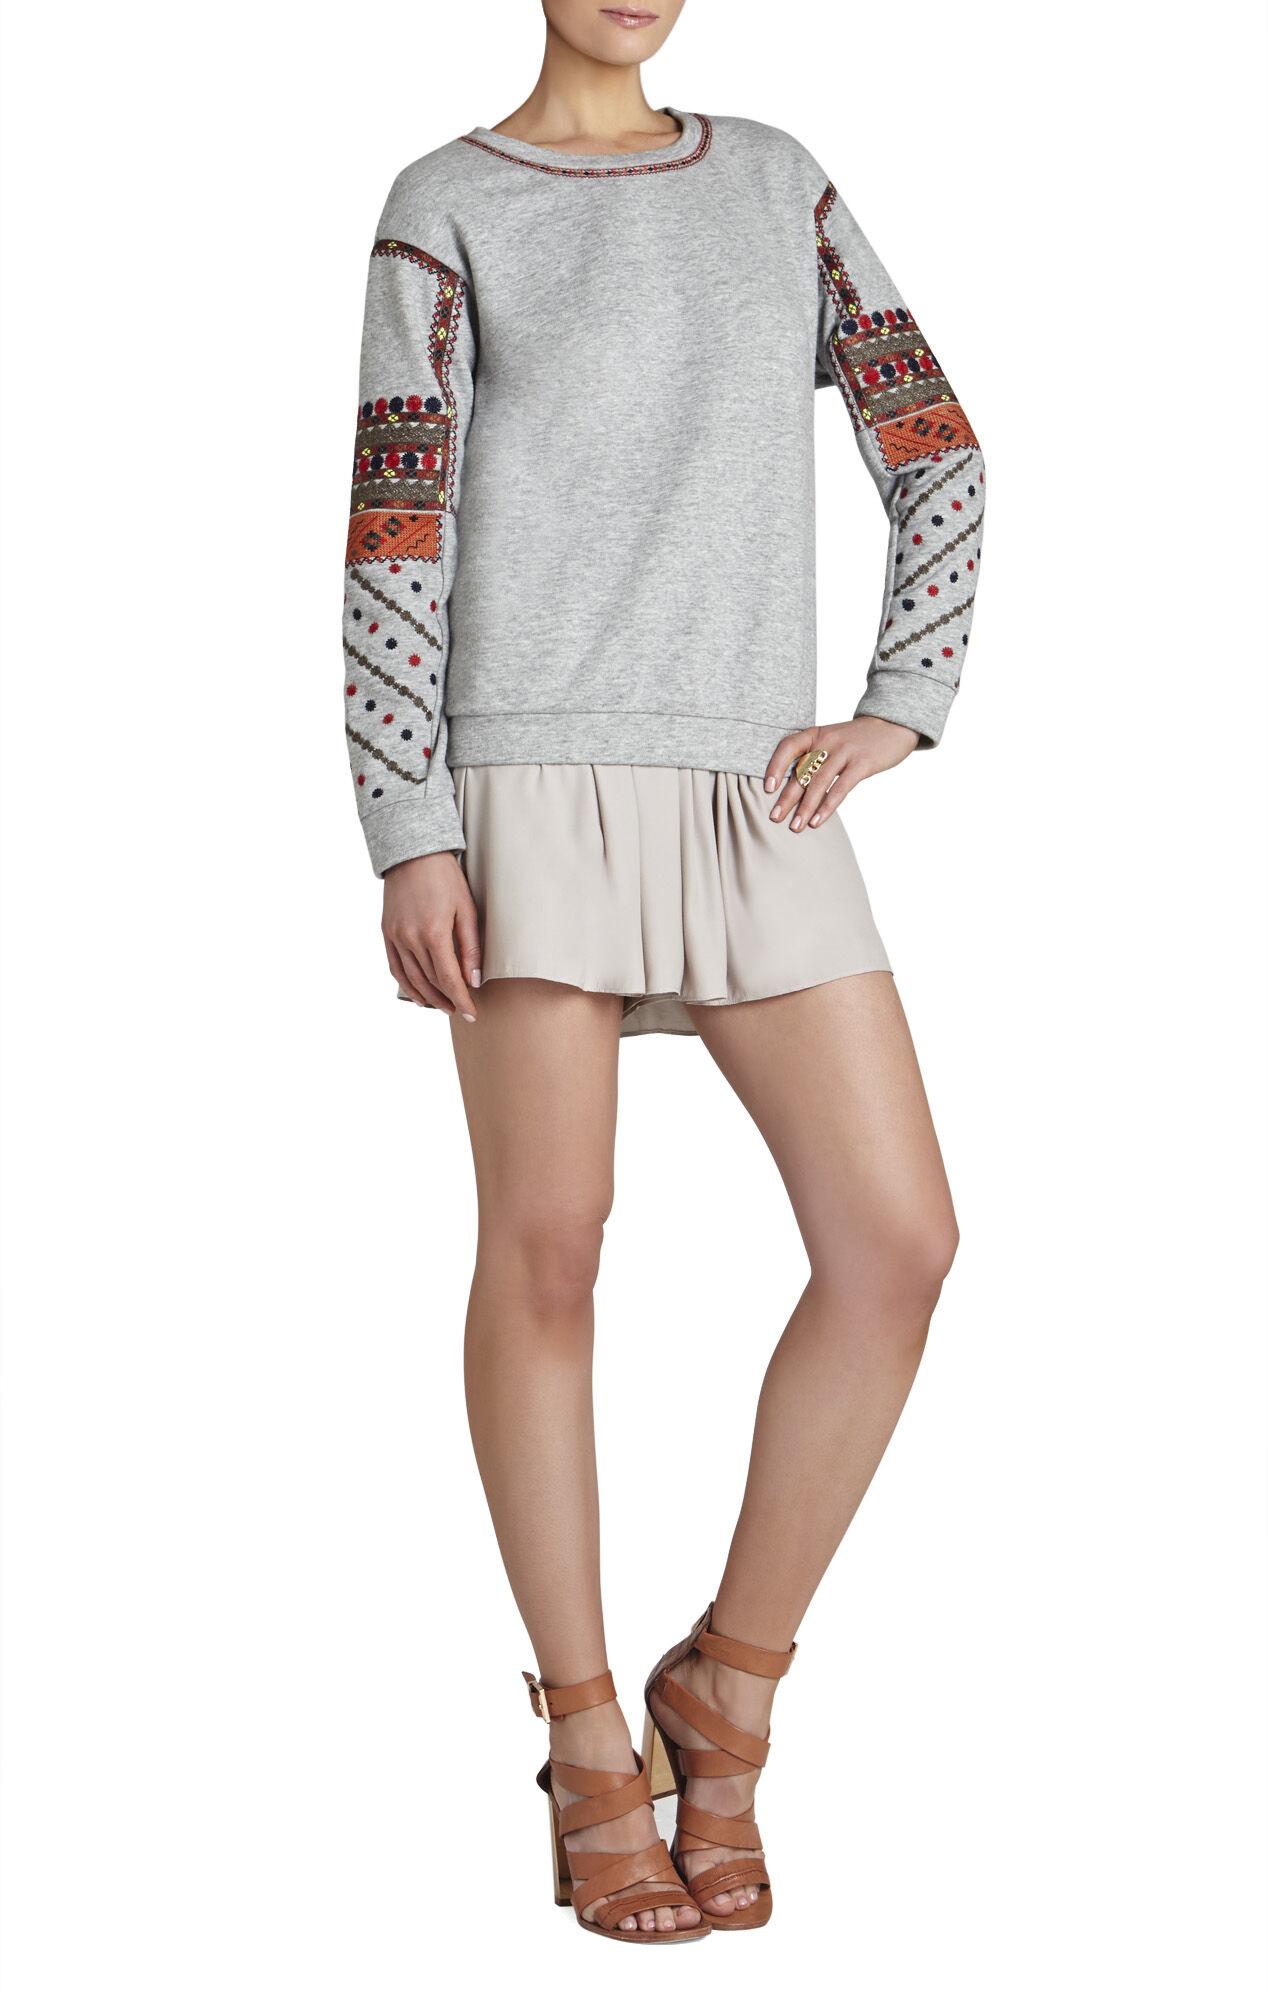 Cori Embroidered Sweatshirt